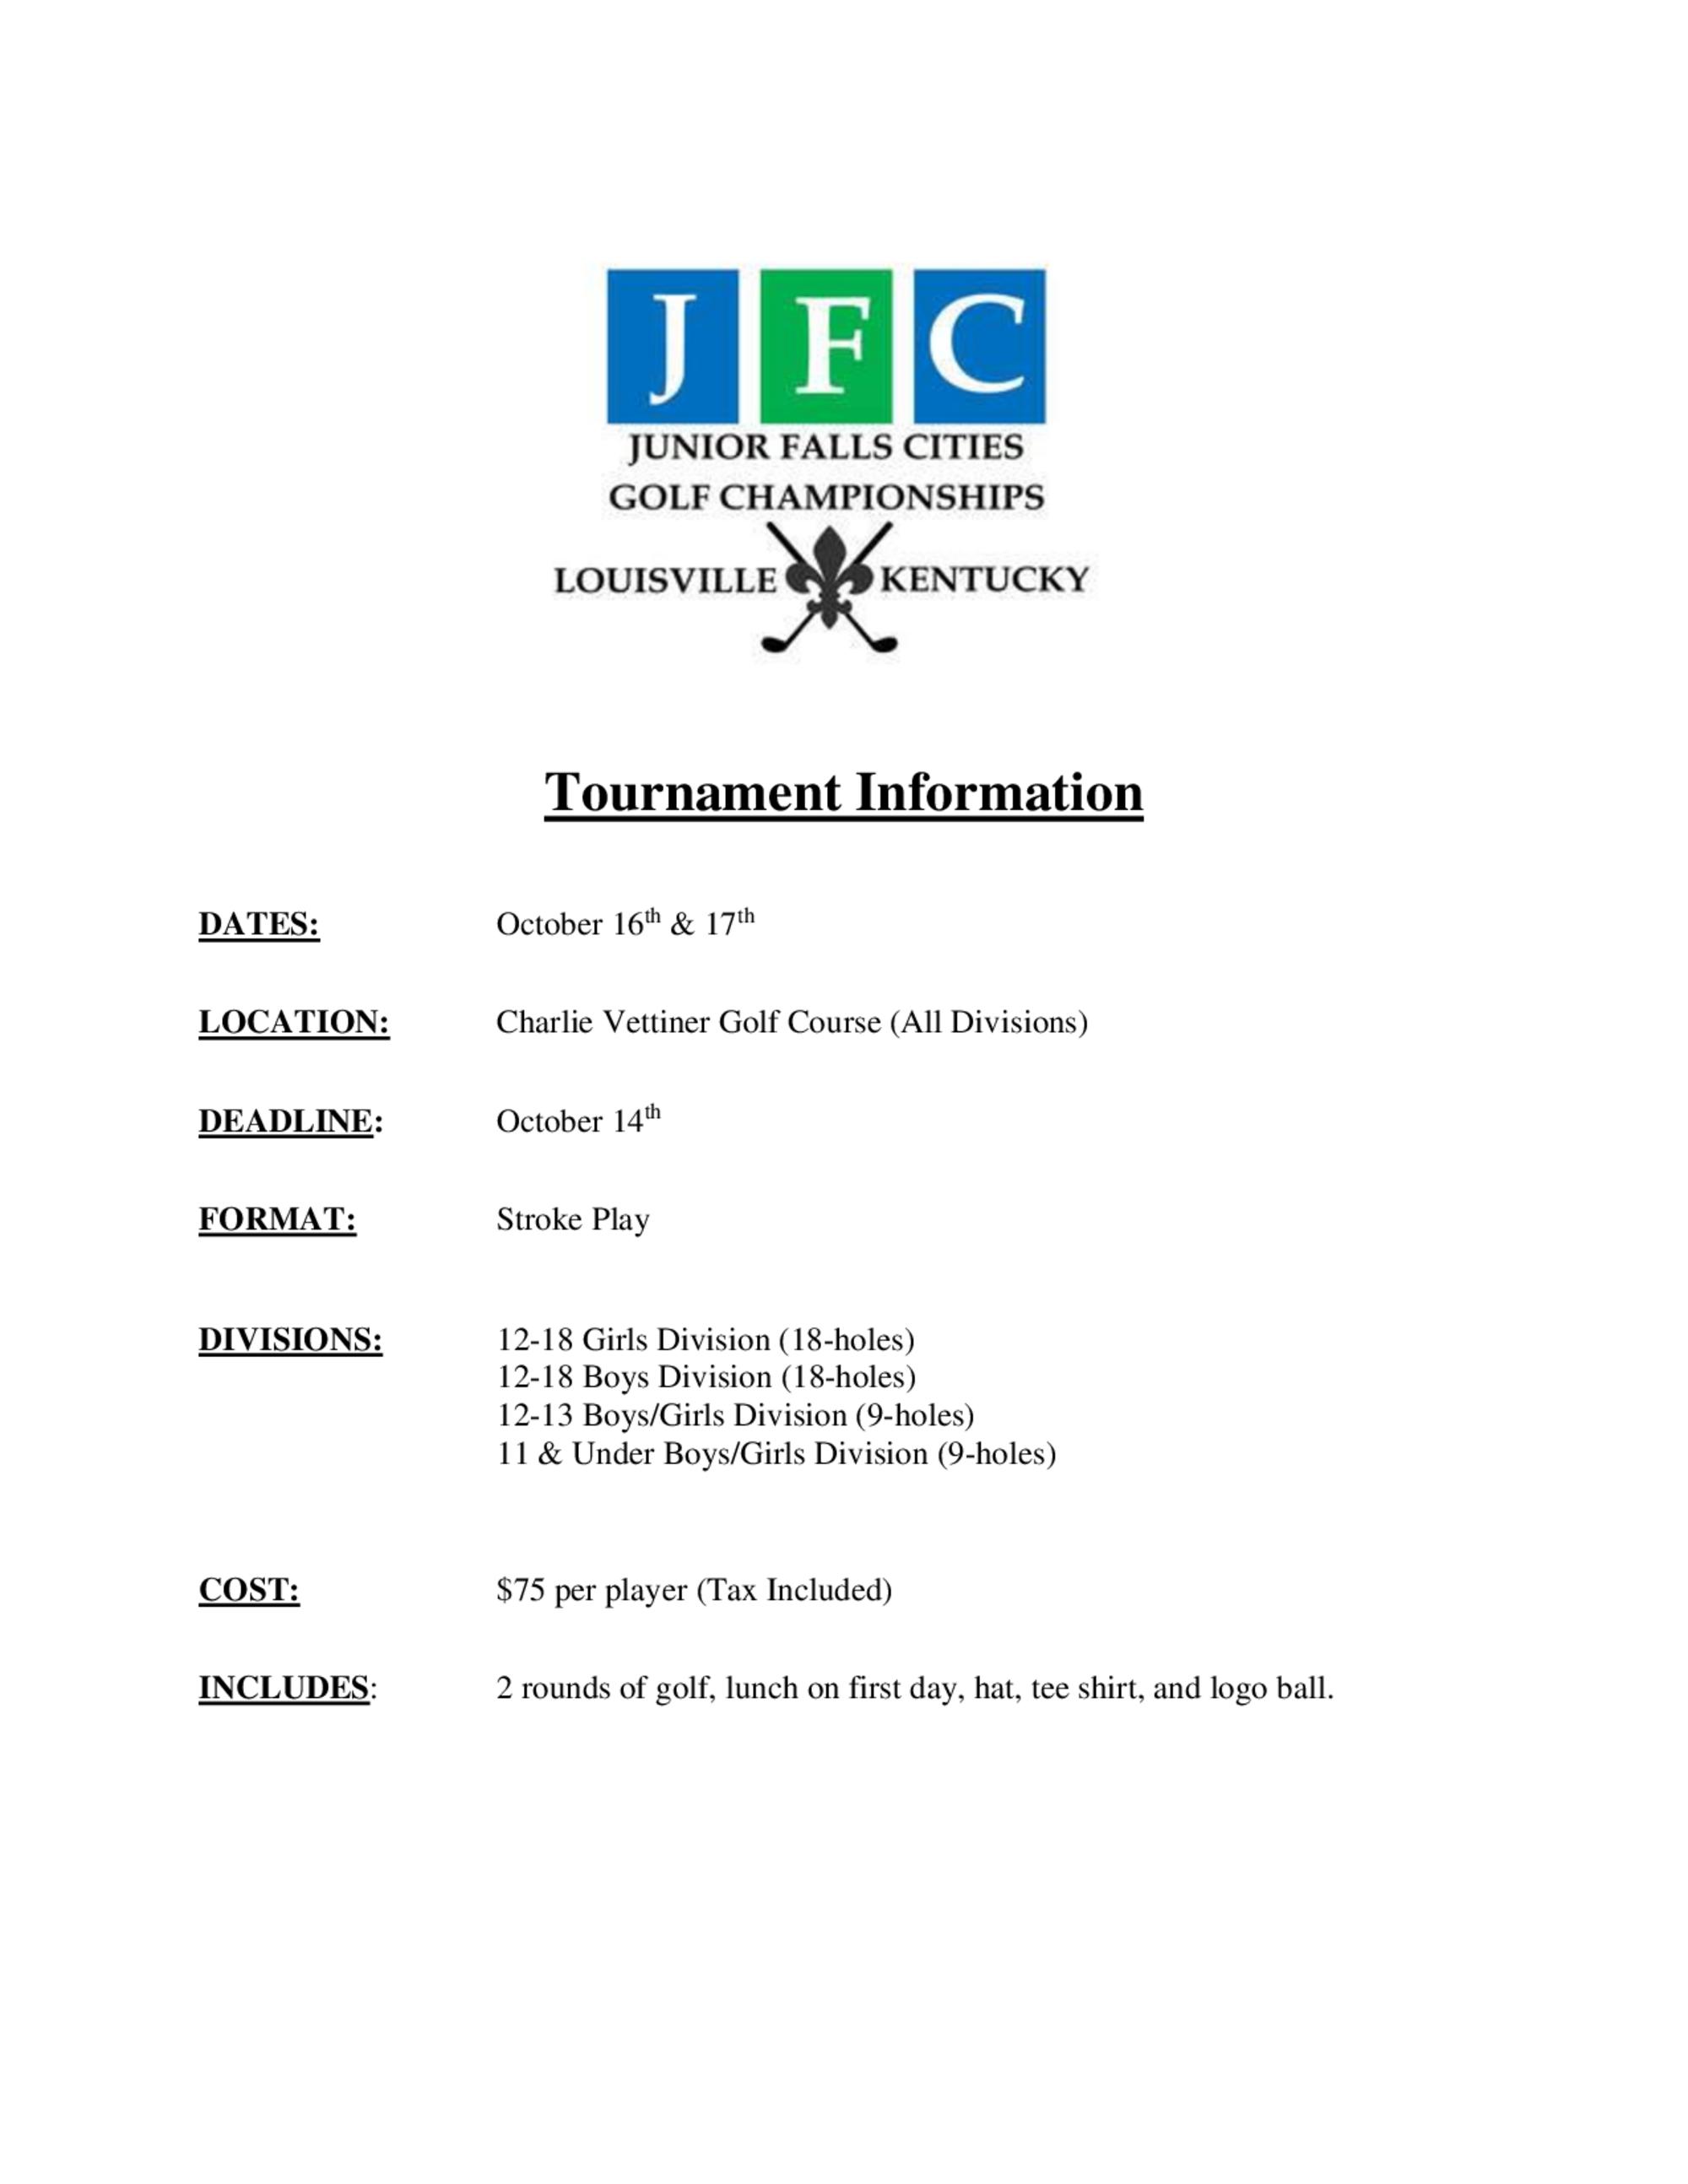 Tournament information 1